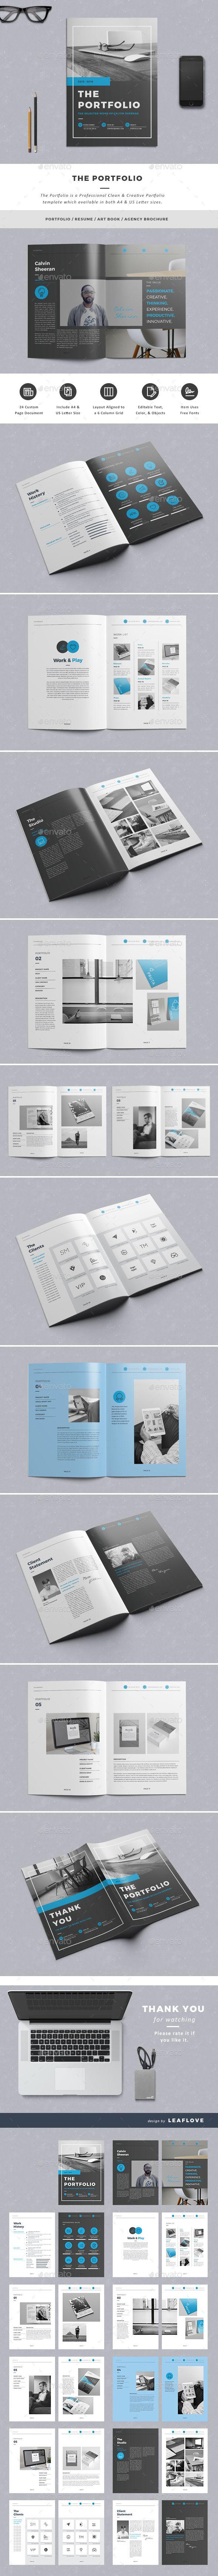 The Portfolio - Portfolio Brochures | Portfolio | Pinterest ...